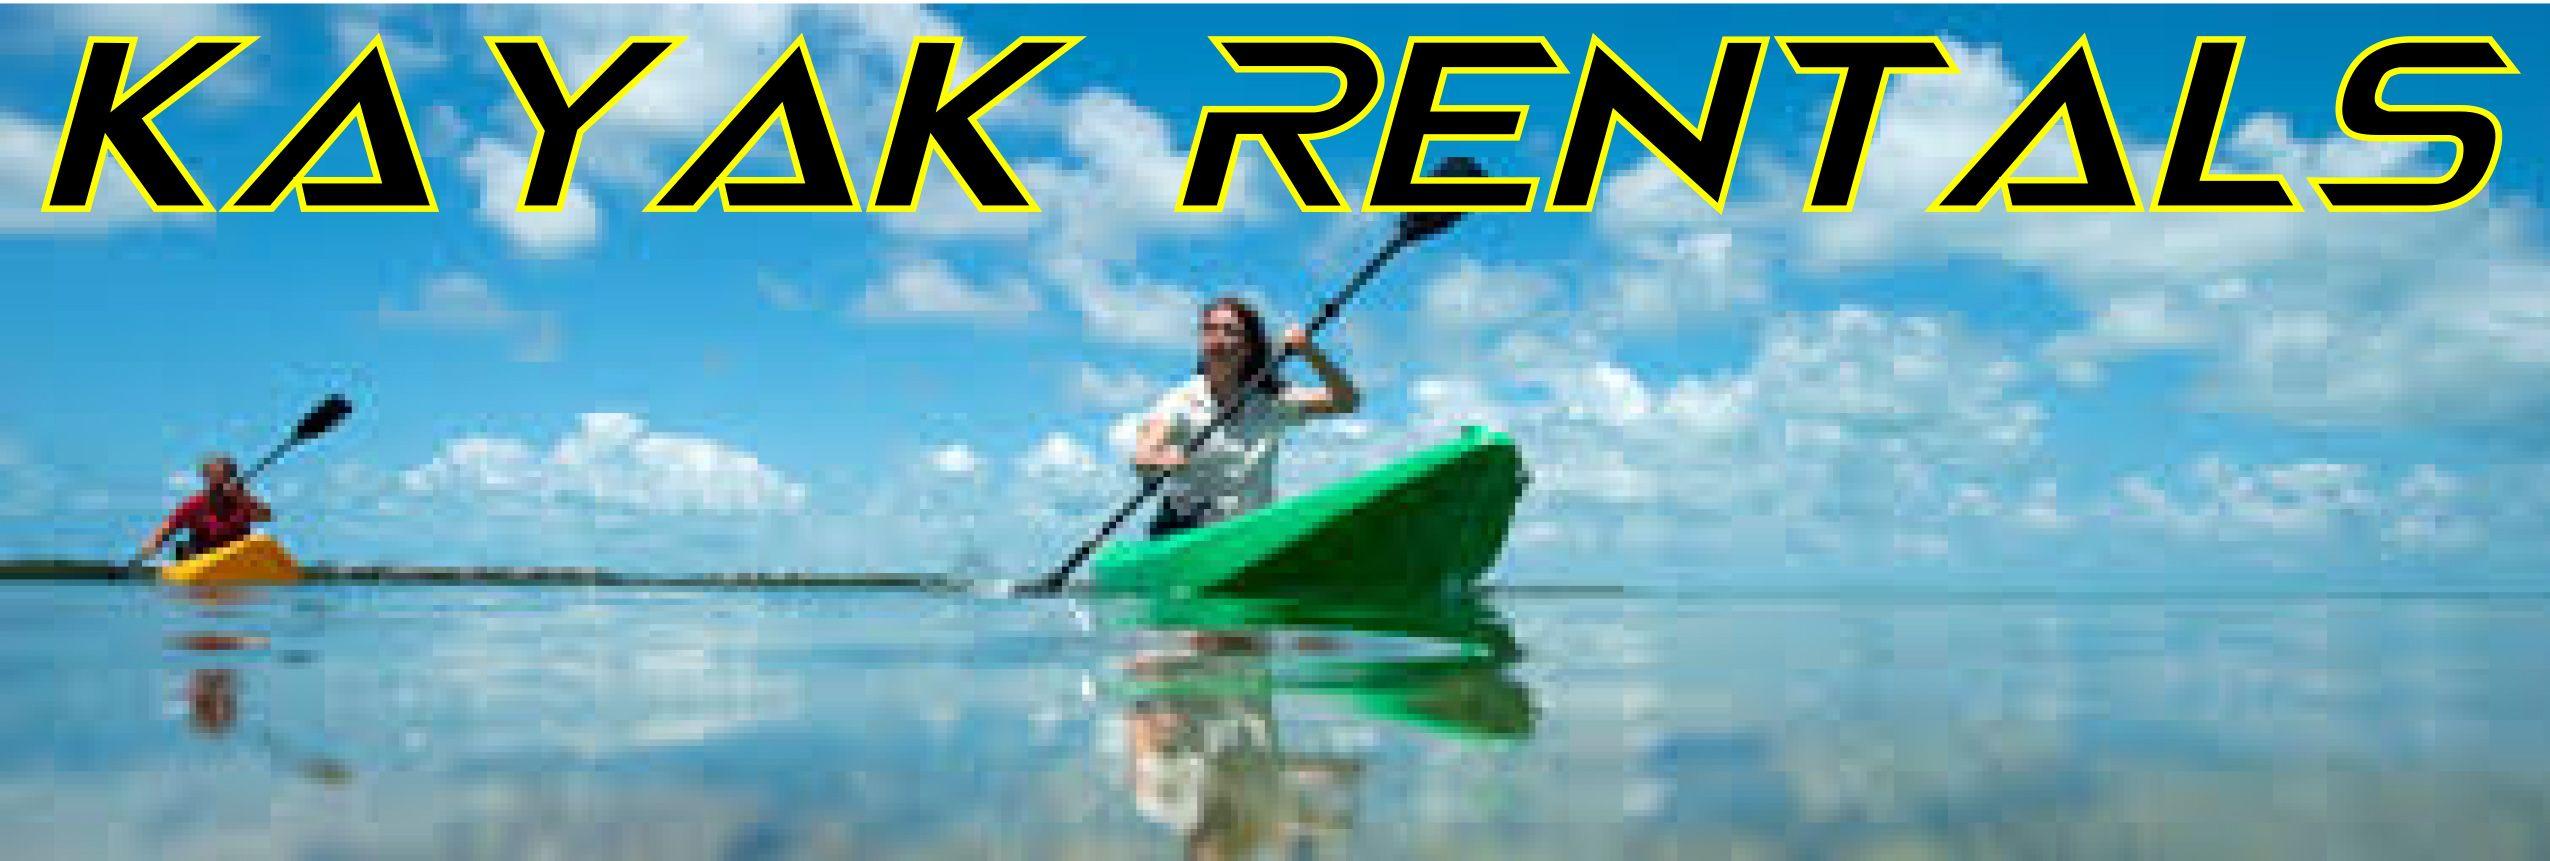 Boat jet ski rentals boat tours on canyon lake texas